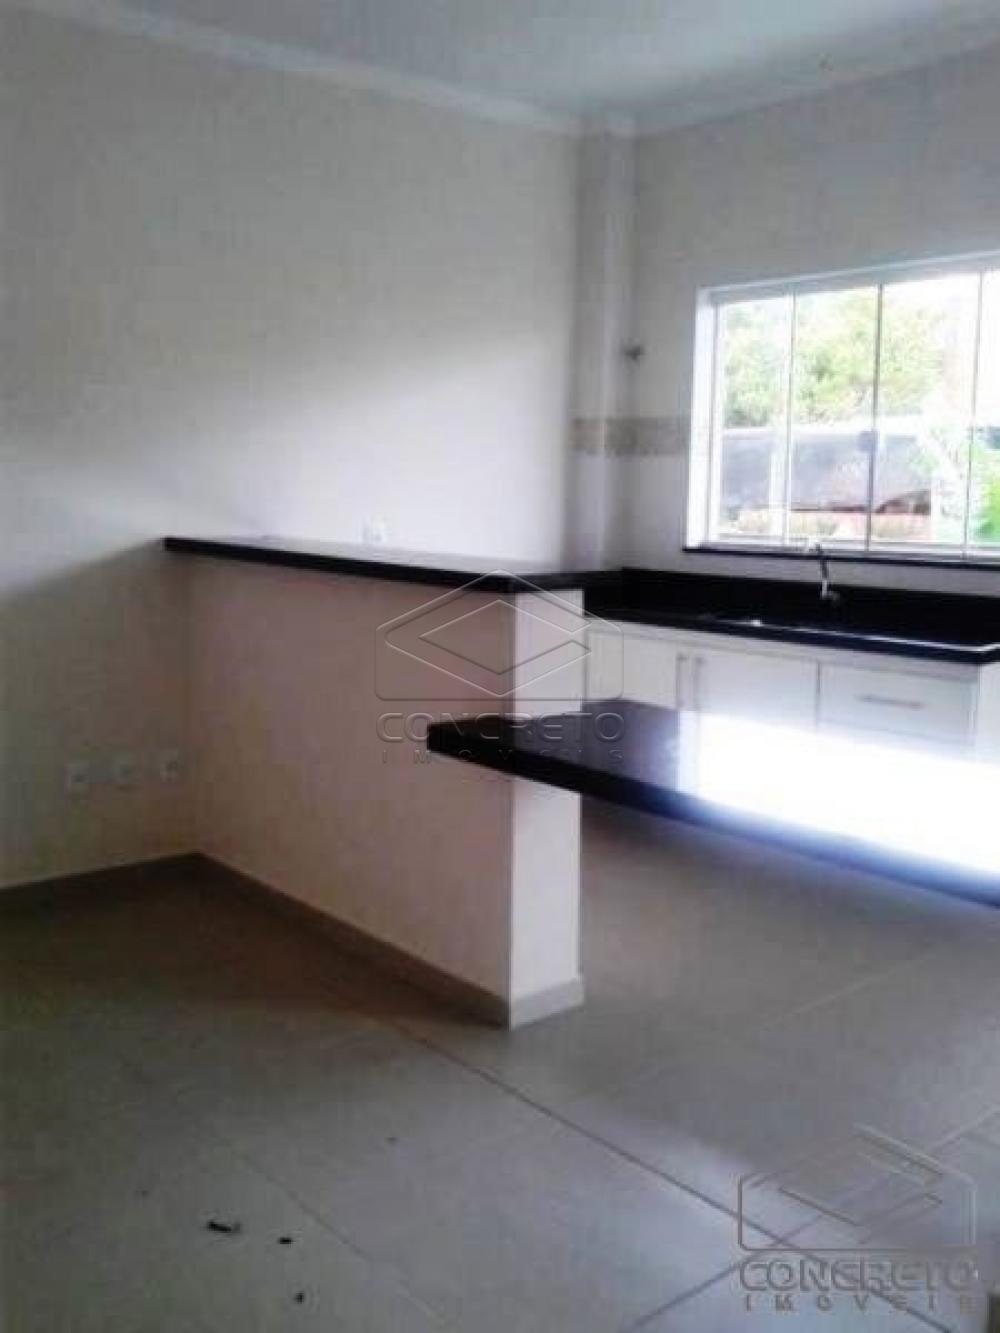 Alugar Apartamentos / Kitinete em Lençóis Paulista R$ 900,00 - Foto 2